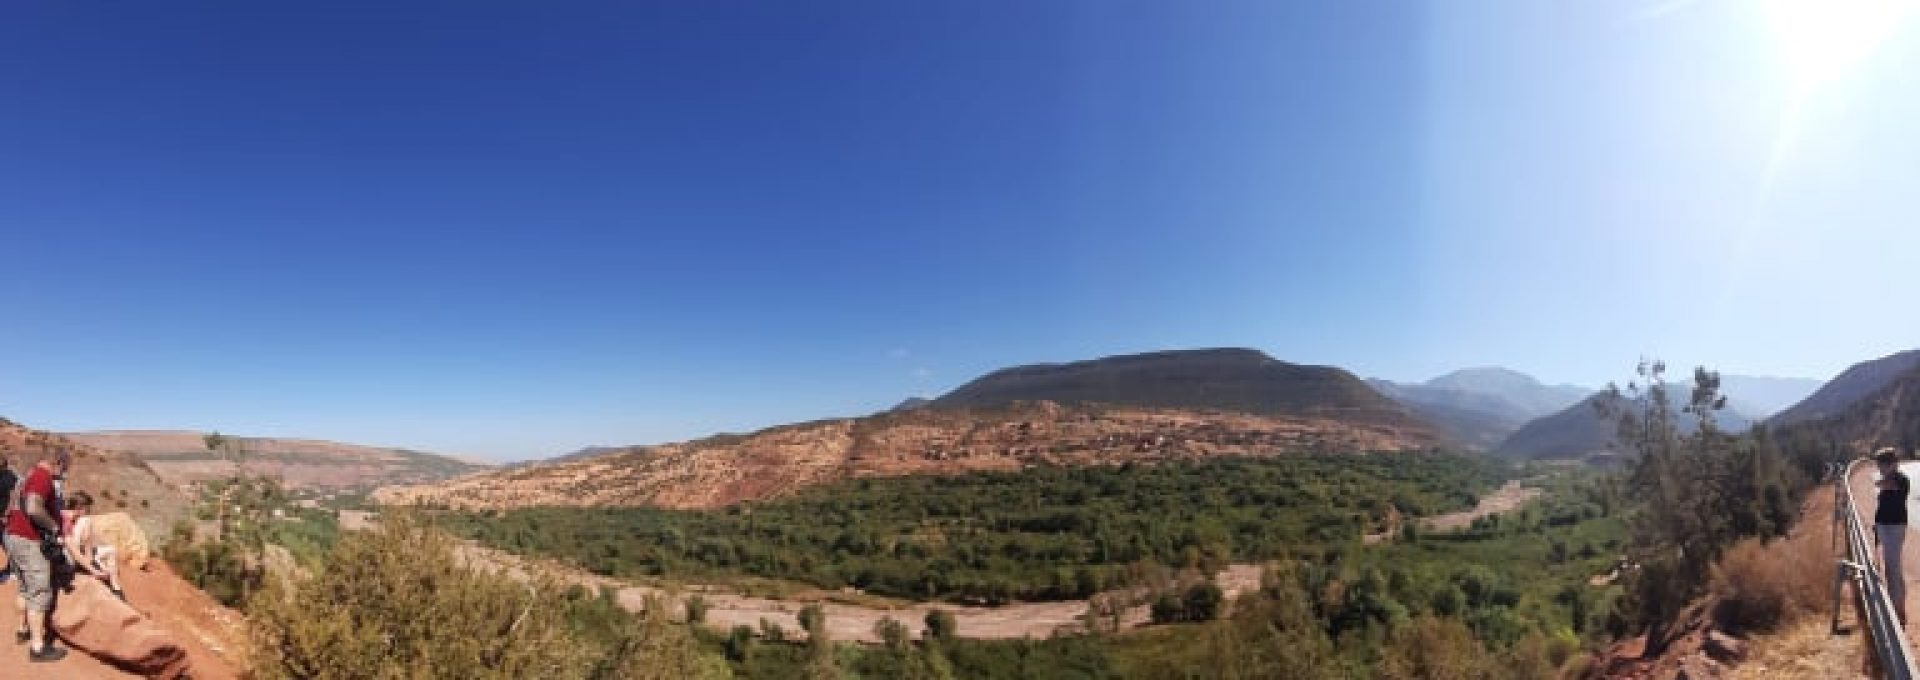 Marrakech4Tours